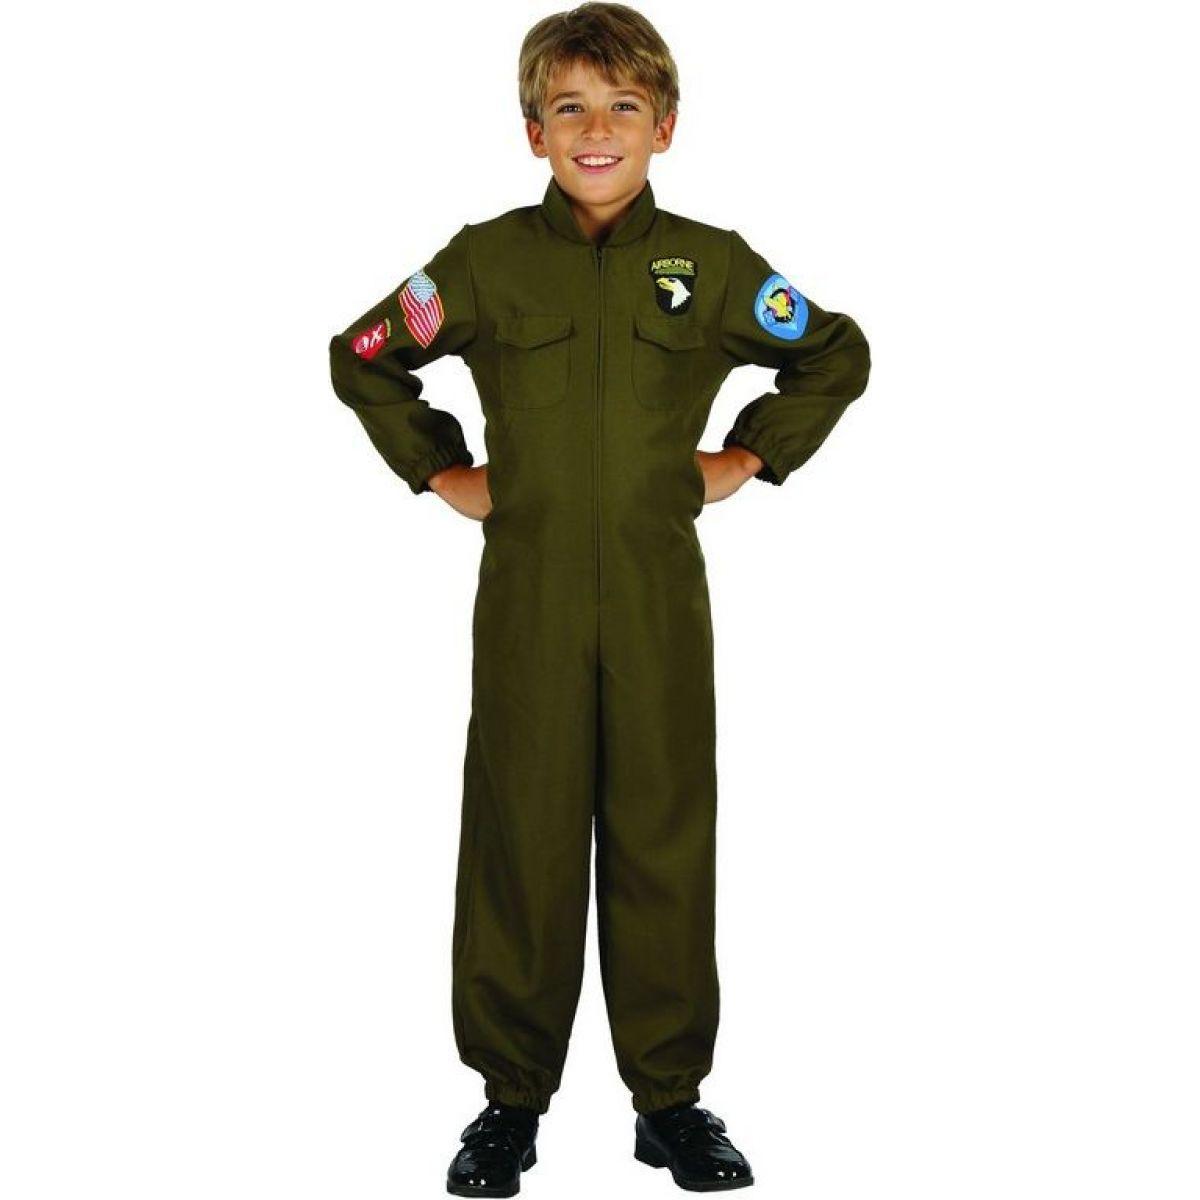 Dětský karnevalový kostým Pilot 110-120 cm